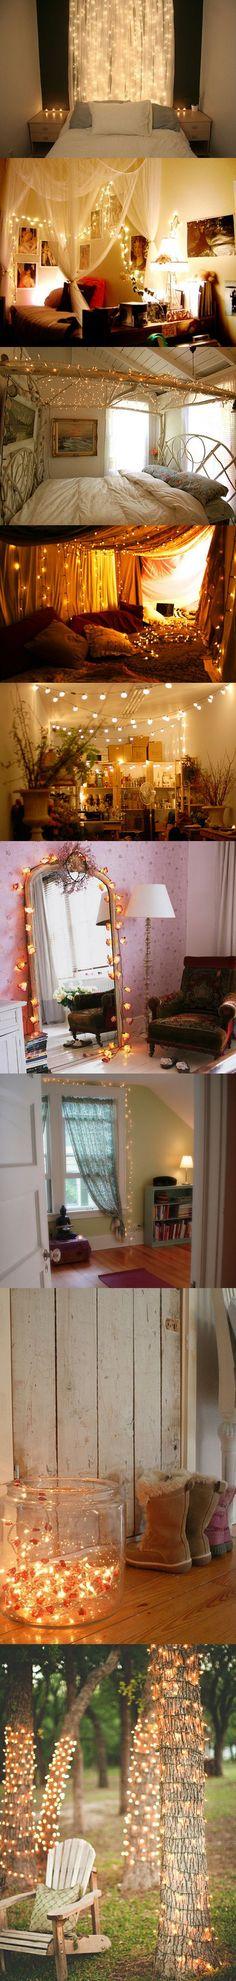 lights lights #home design #home interior design 2012  http://homedesignphotoscollection.blogspot.com